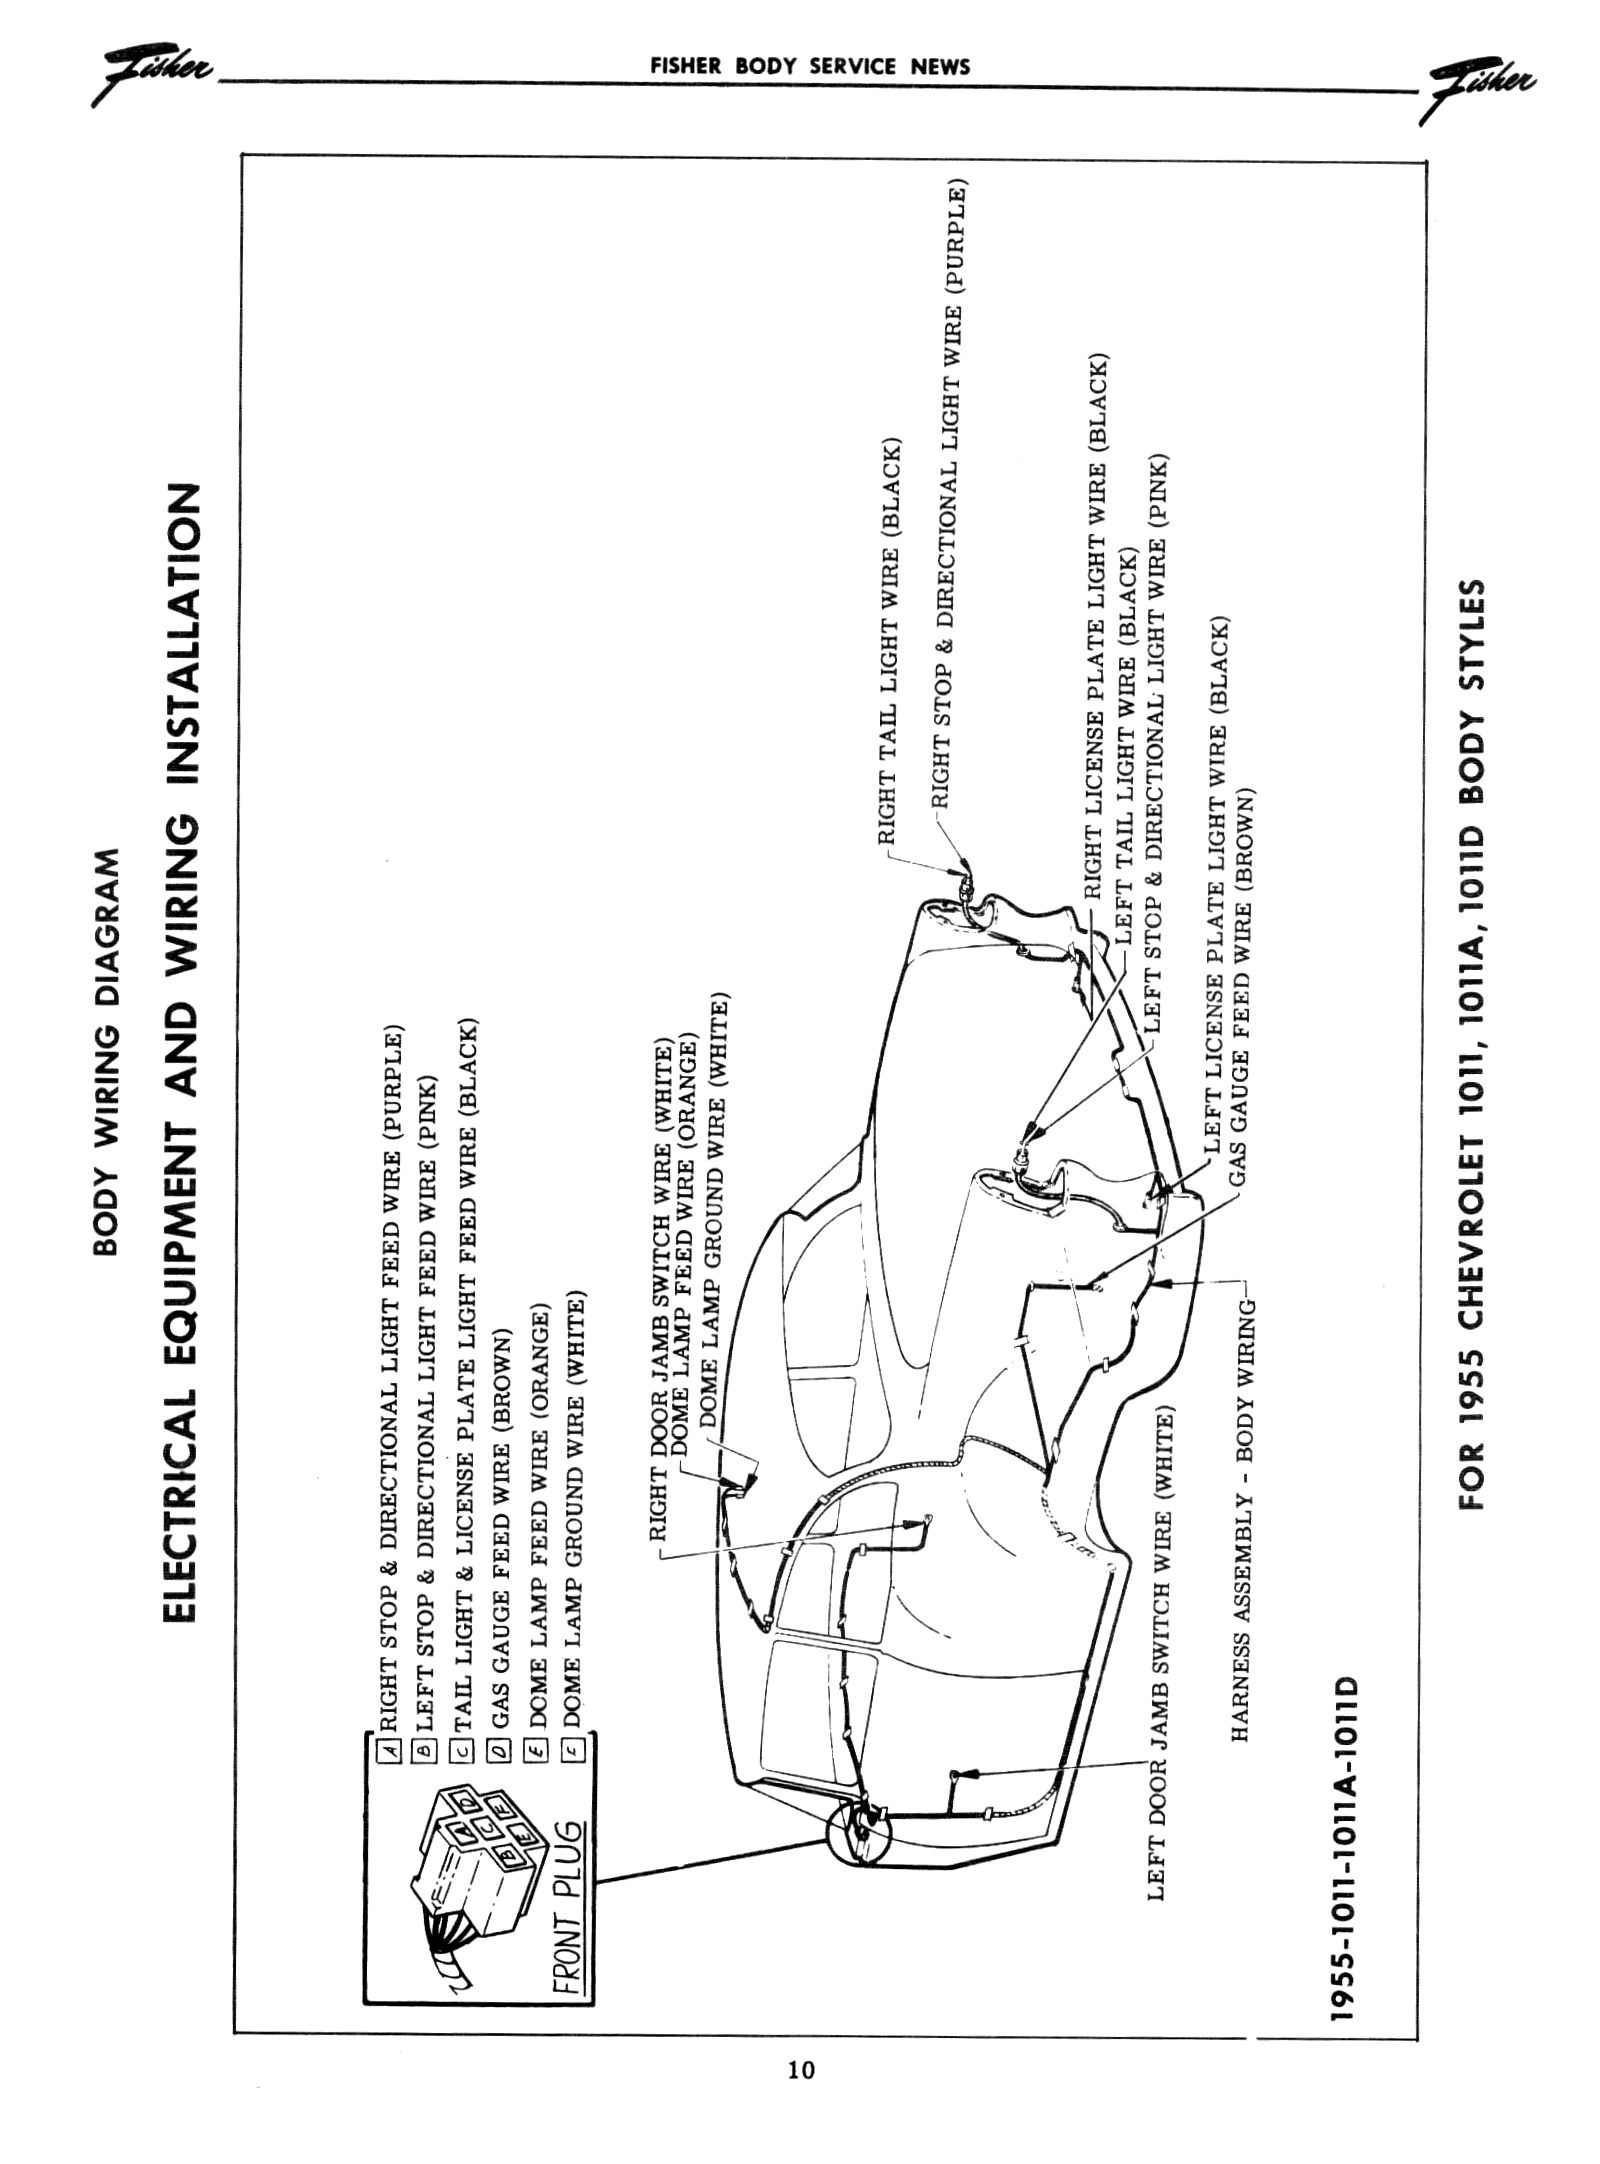 Toyota Dome Light Wiring Diagram Wiring Diagram